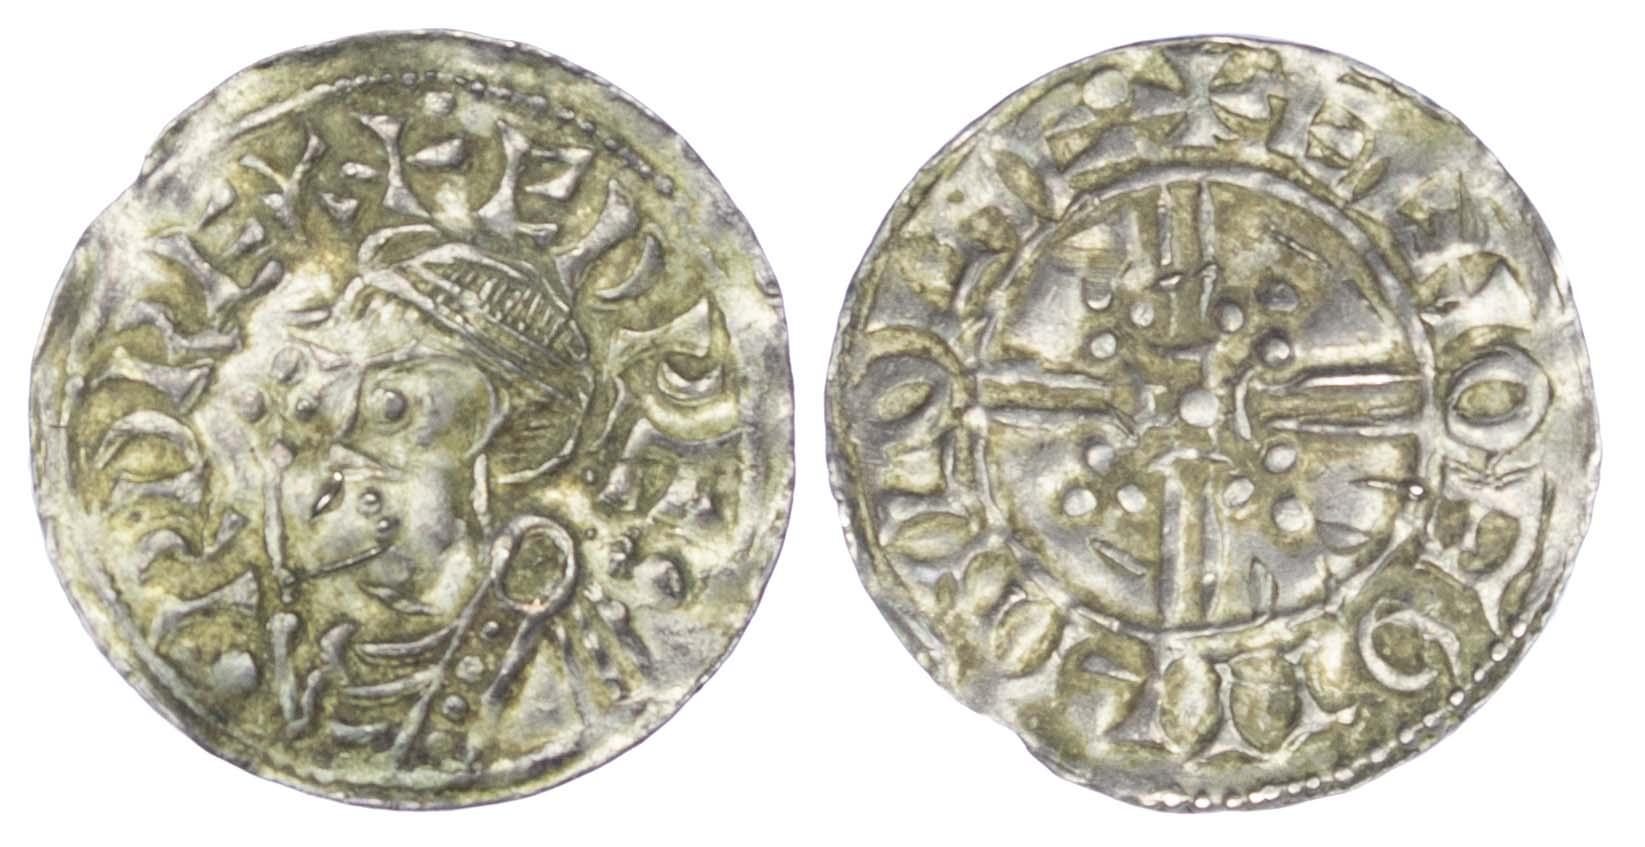 Edward the Confessor (1042-1066), Penny, Trefoil Quadrilateral, Lincoln